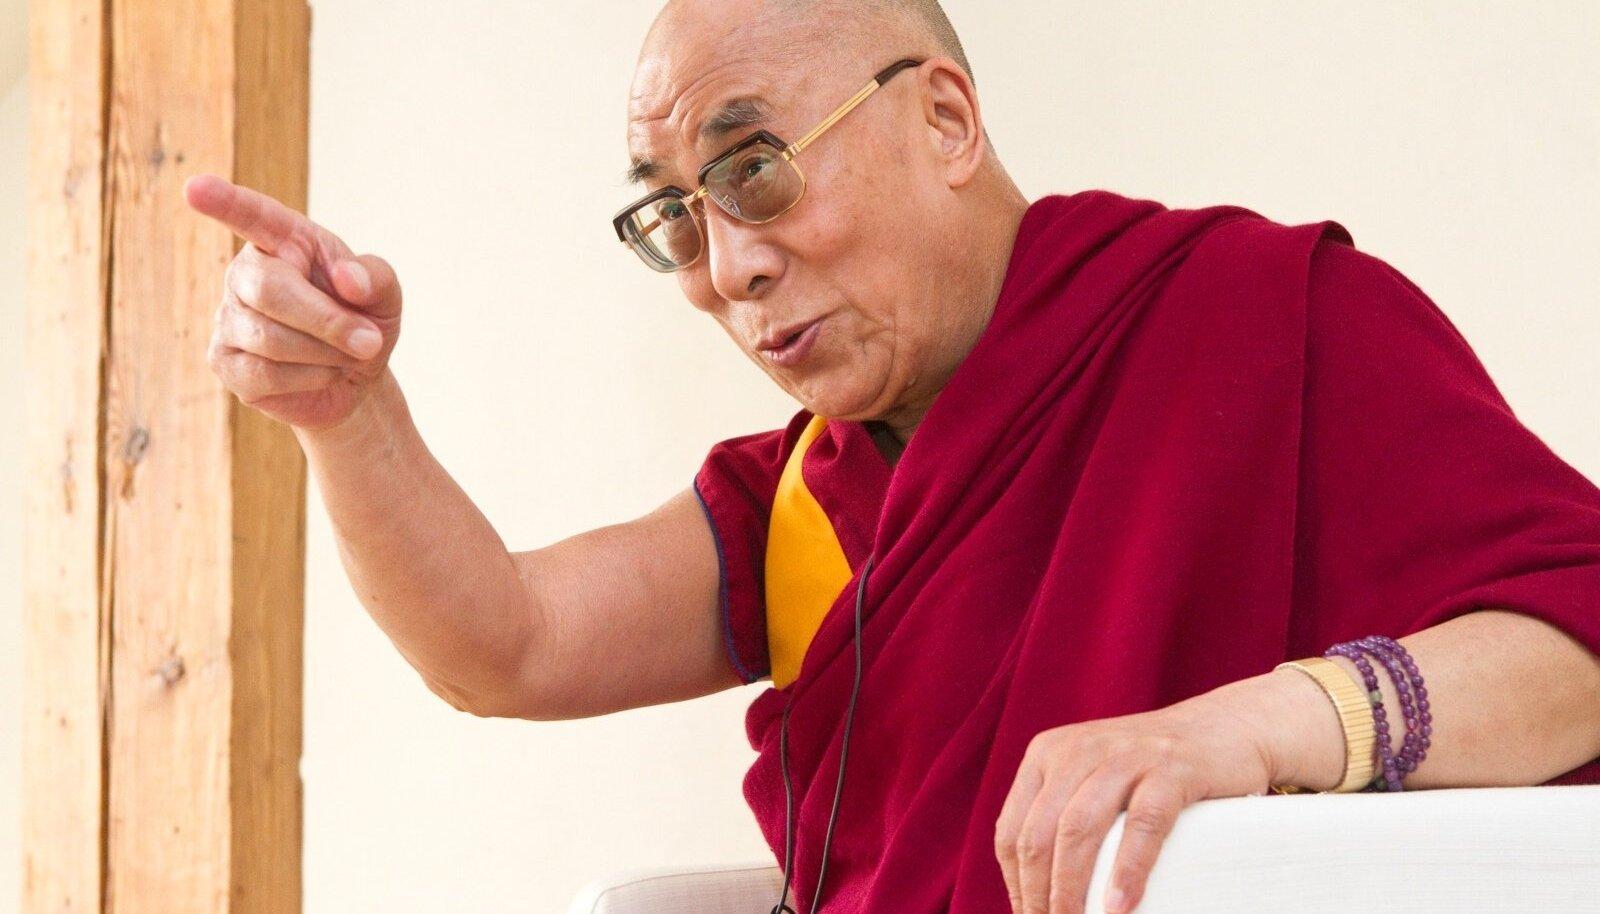 Tema Pühadus XIV dalai-laama Tenzin Gyatso